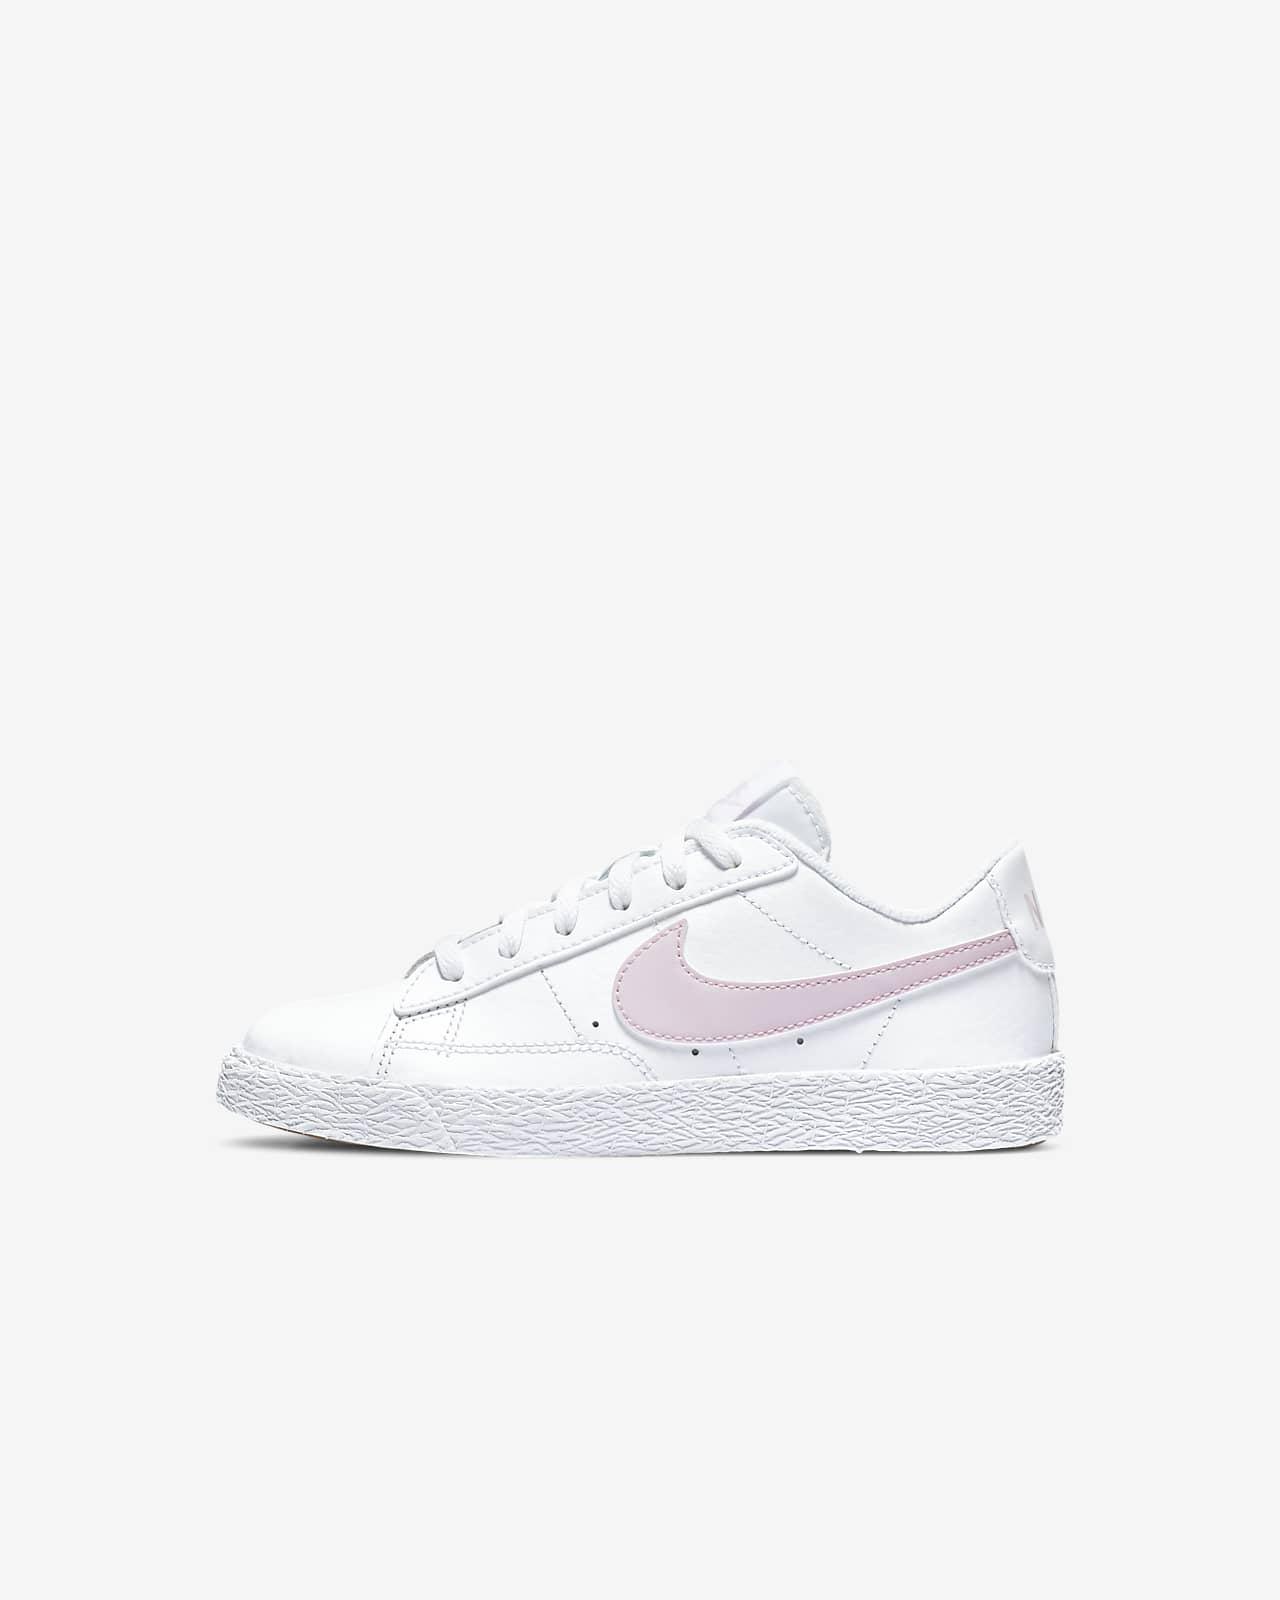 Sko Nike Blazer Low för barn